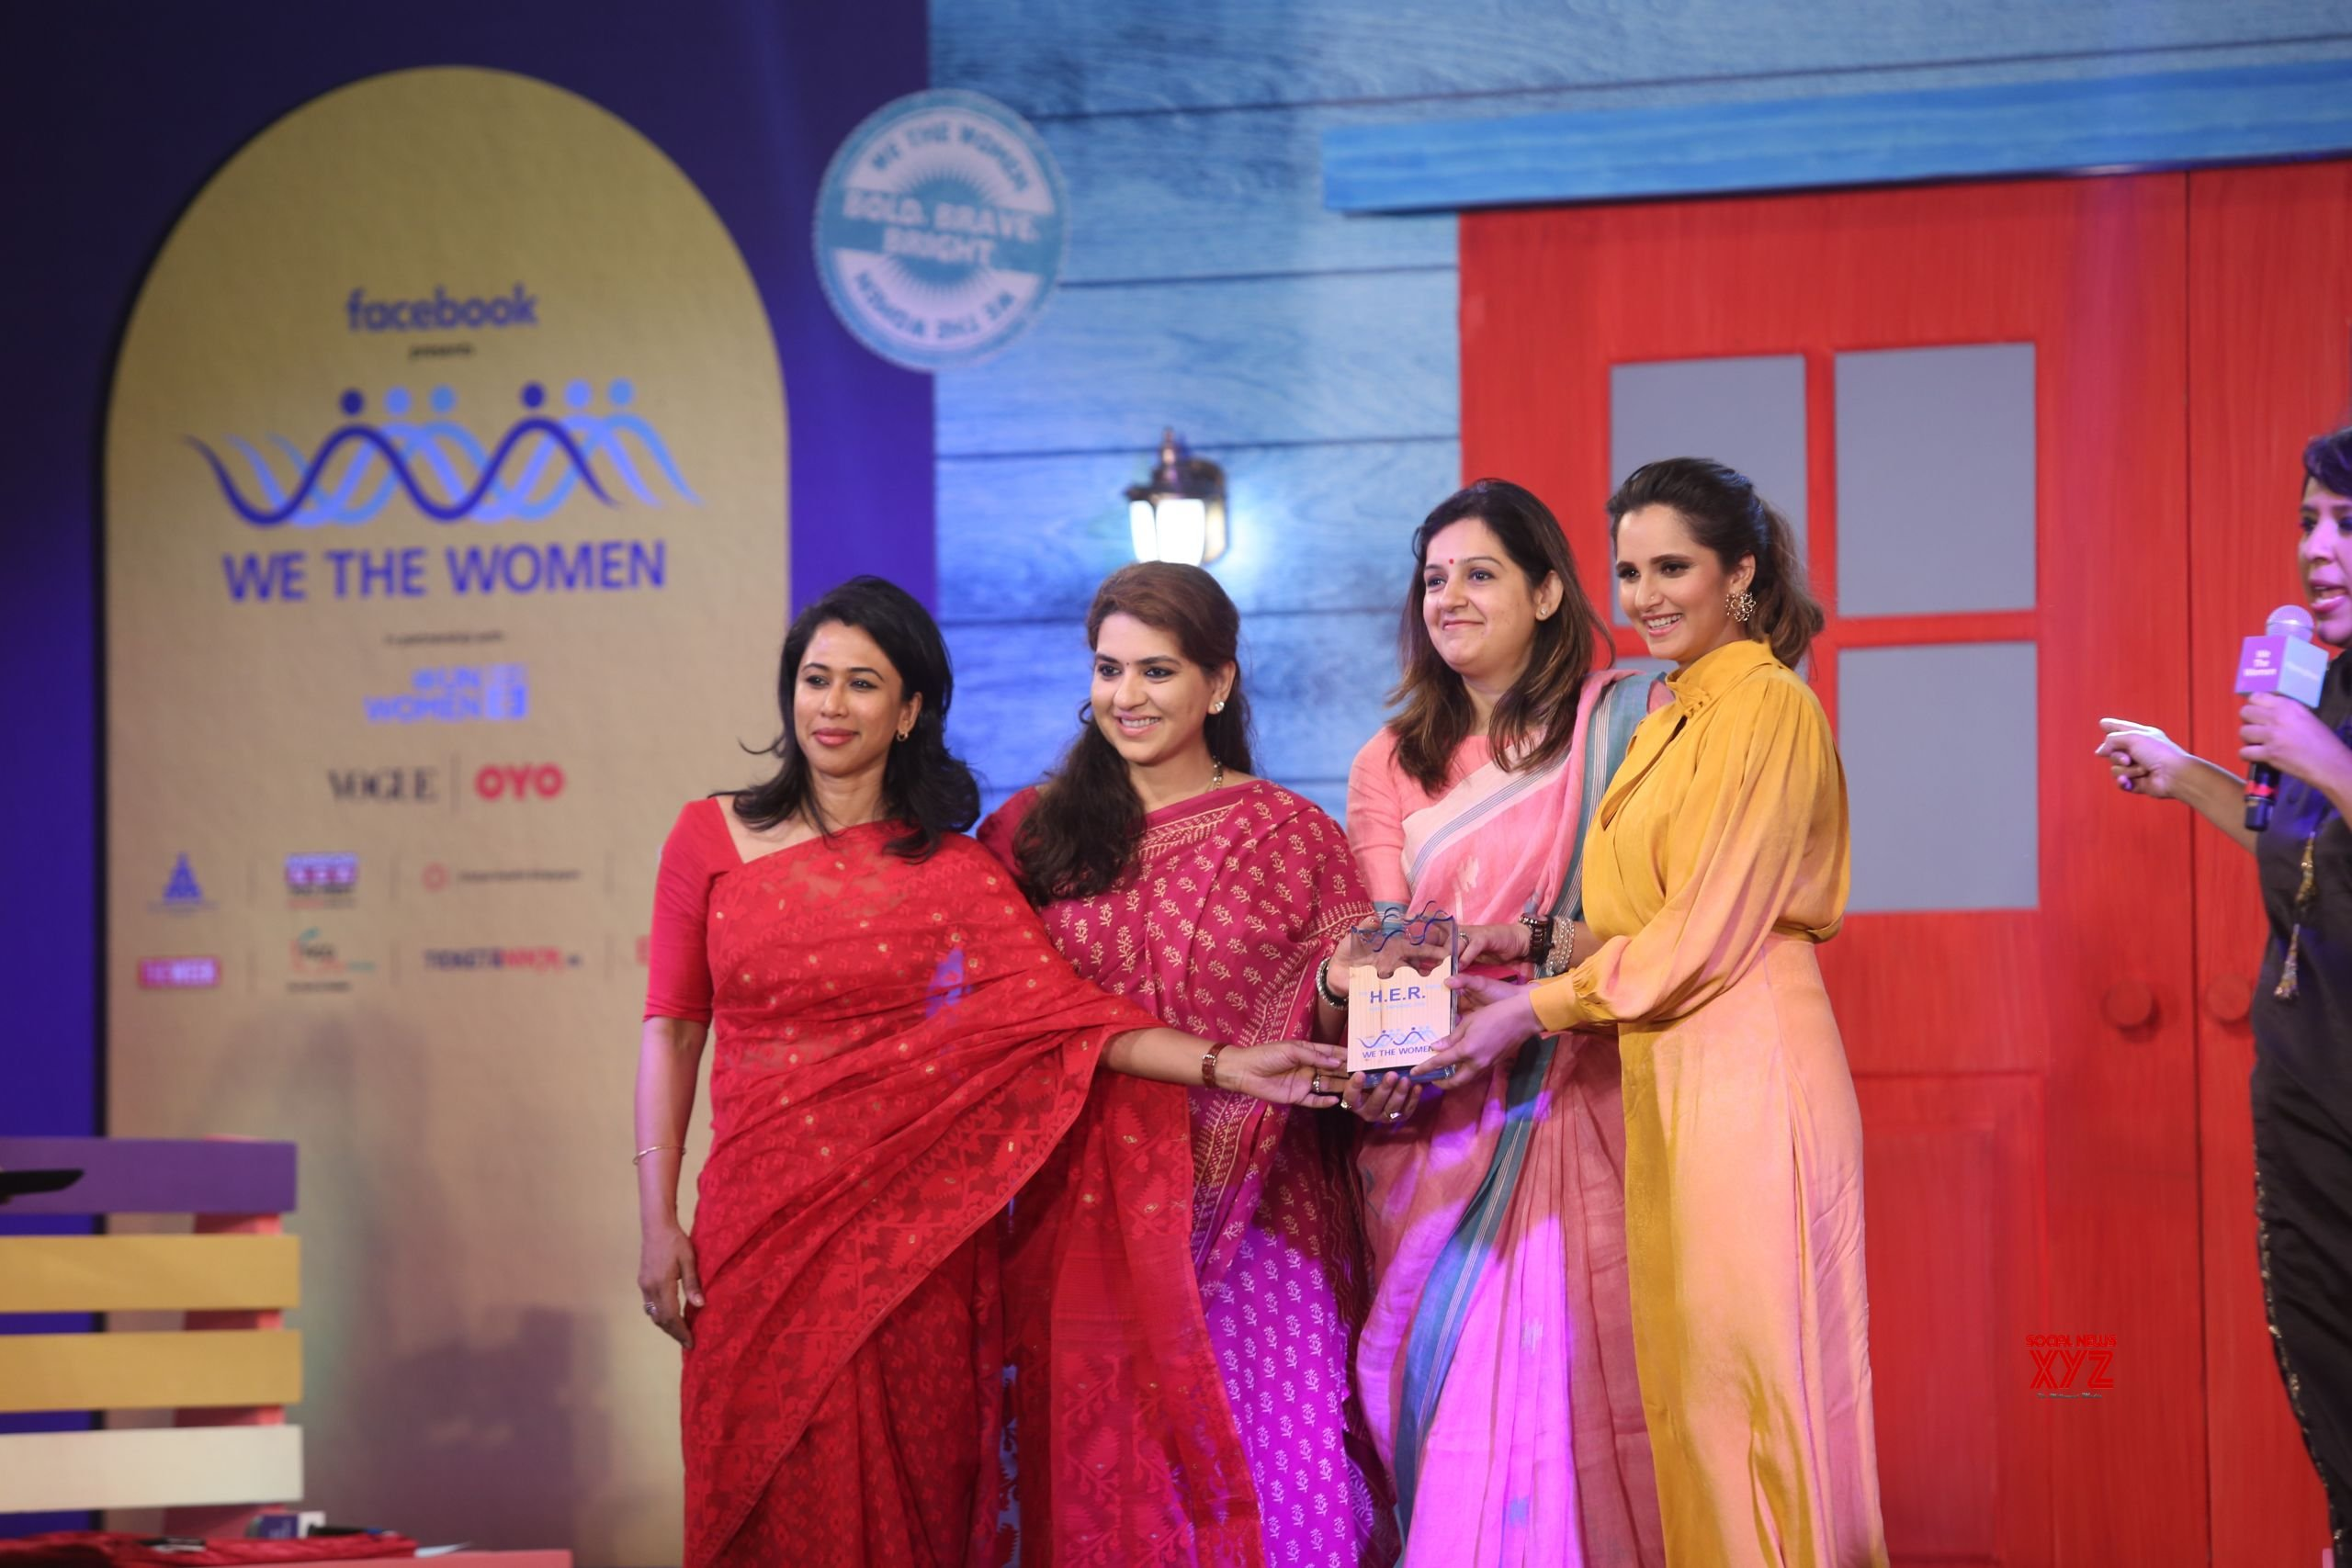 foto de Alia Bhatt, Katrina Kaif, Sonali Bendre, Sania Mirza, Karan Johar ...